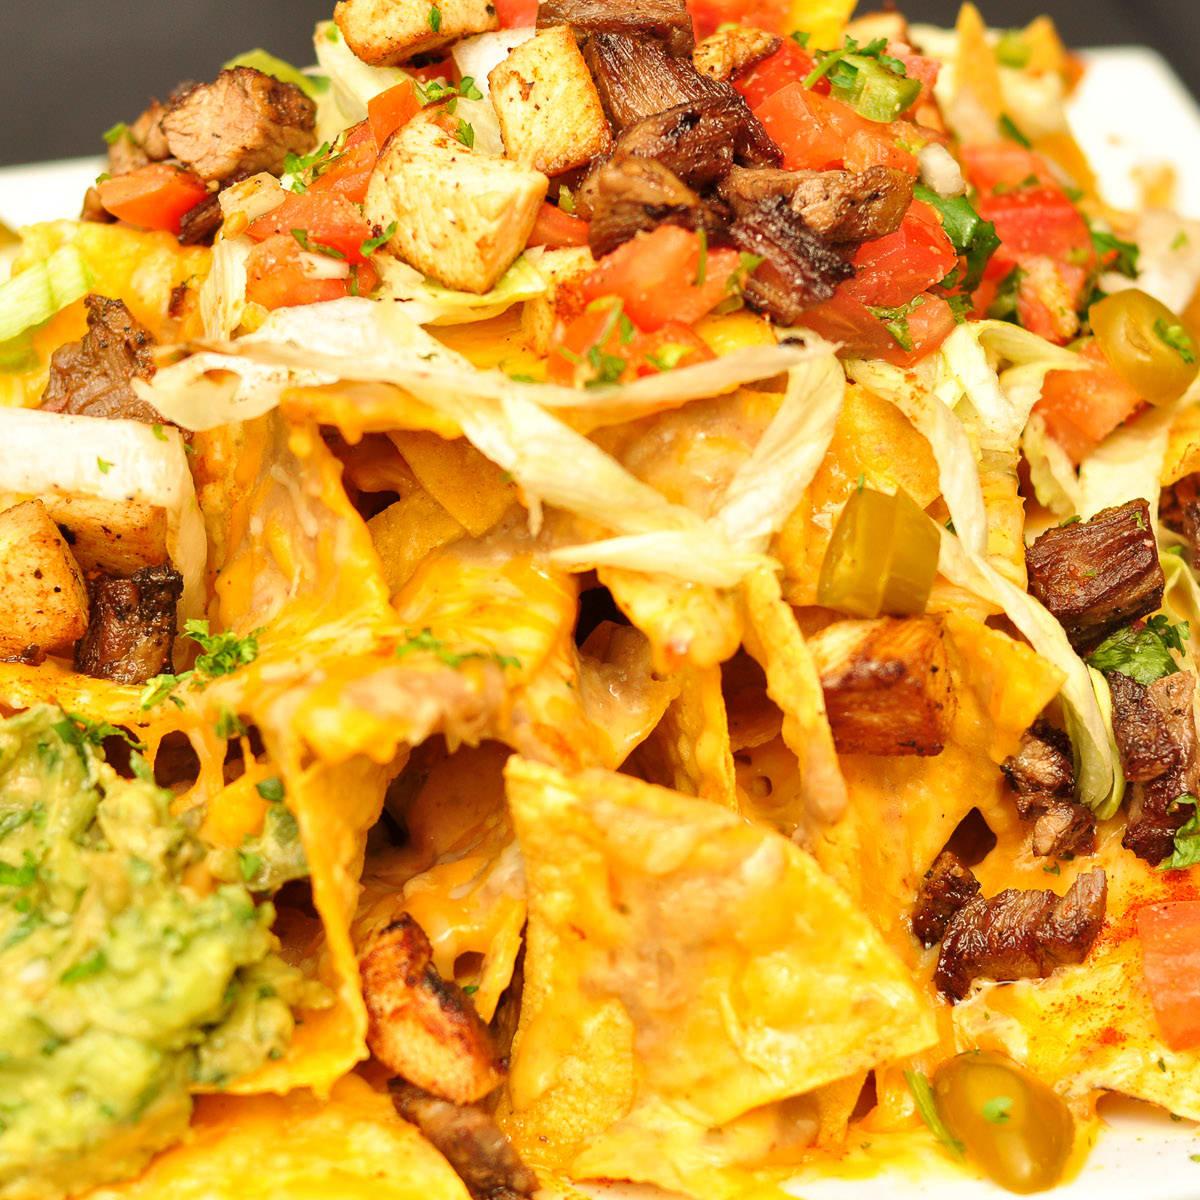 News_Pub Fiction_new menu_nachos